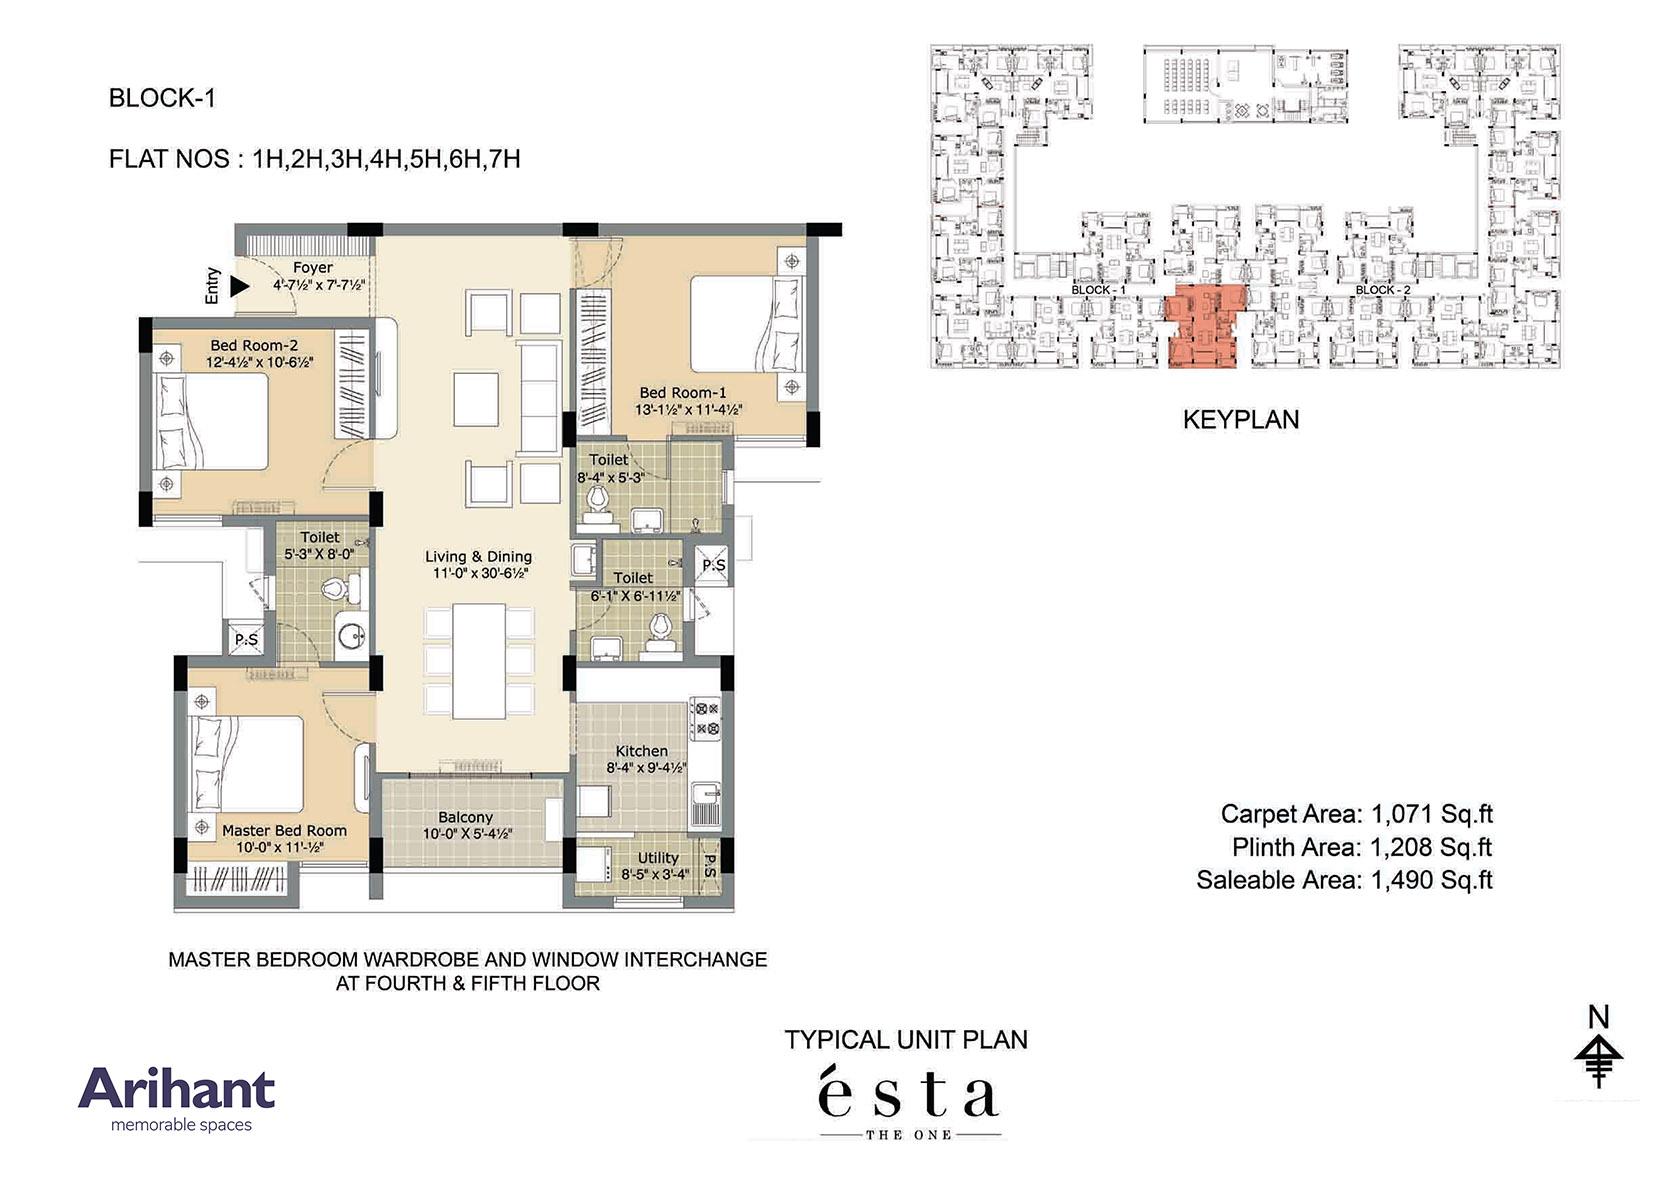 Arihant - Esta_Typical Unit Plan - Block 1 - Type H